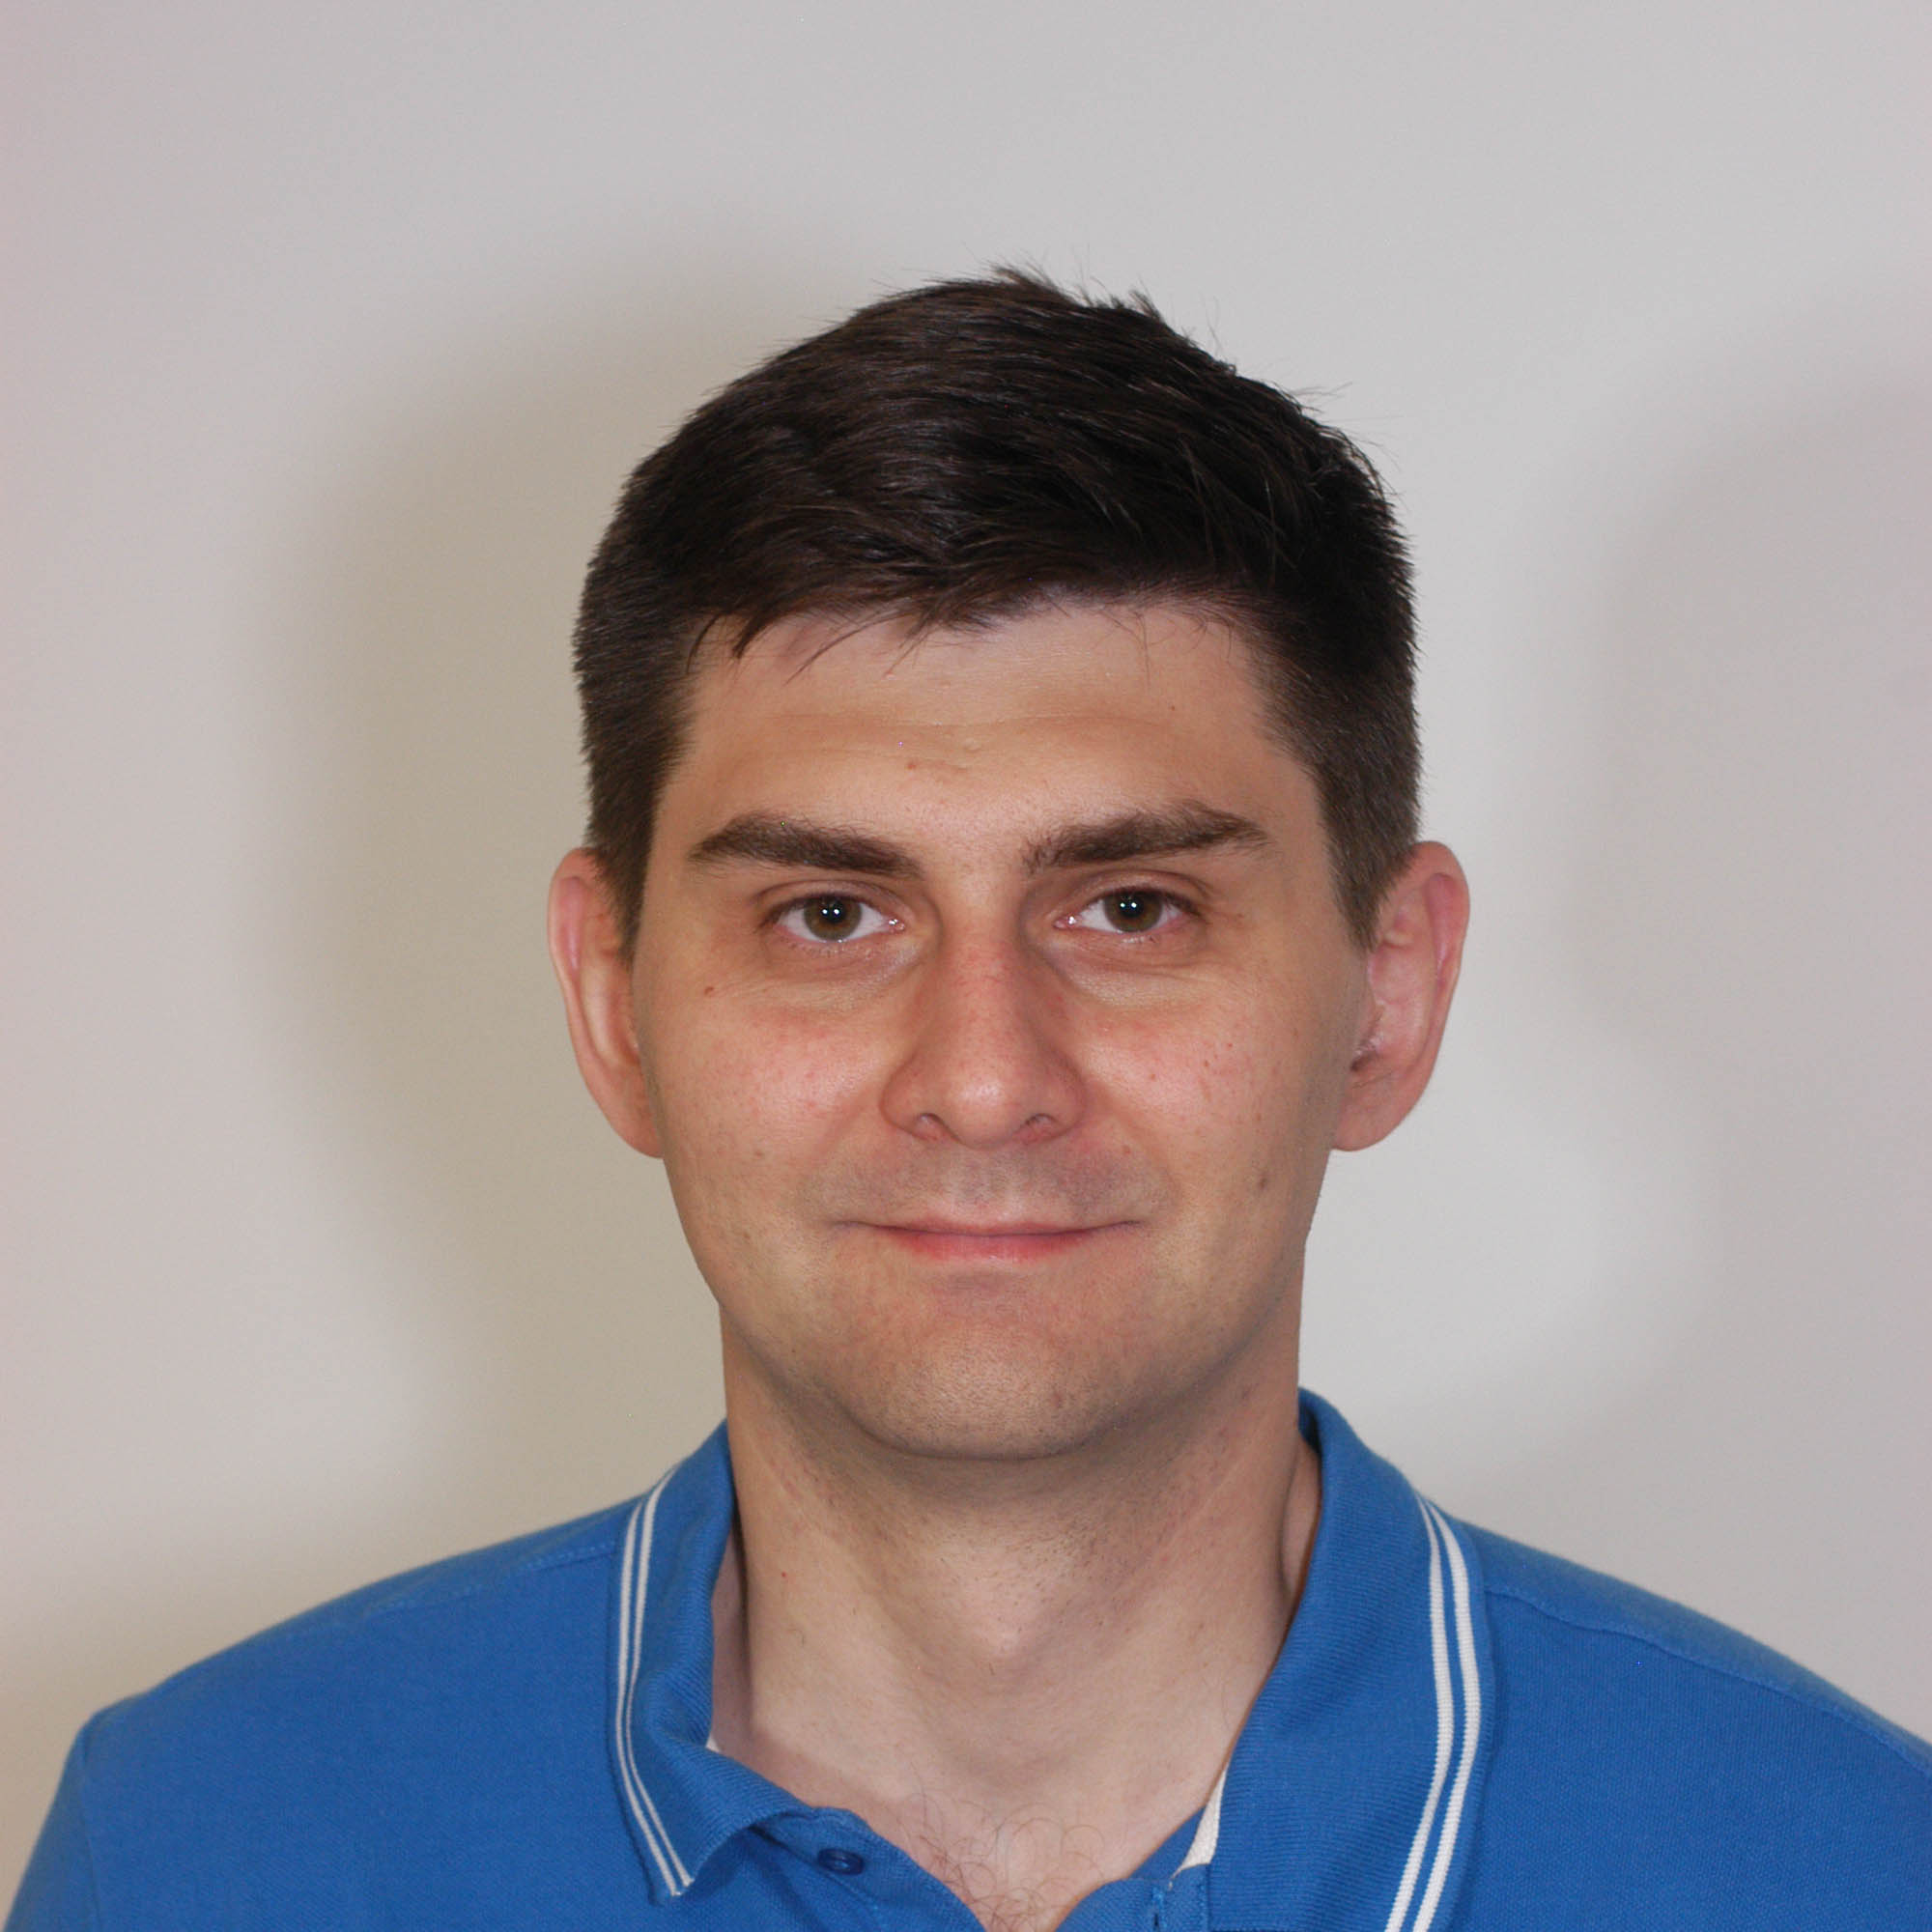 Kirill Nadezhdin – Post-doctoral Research Scientist